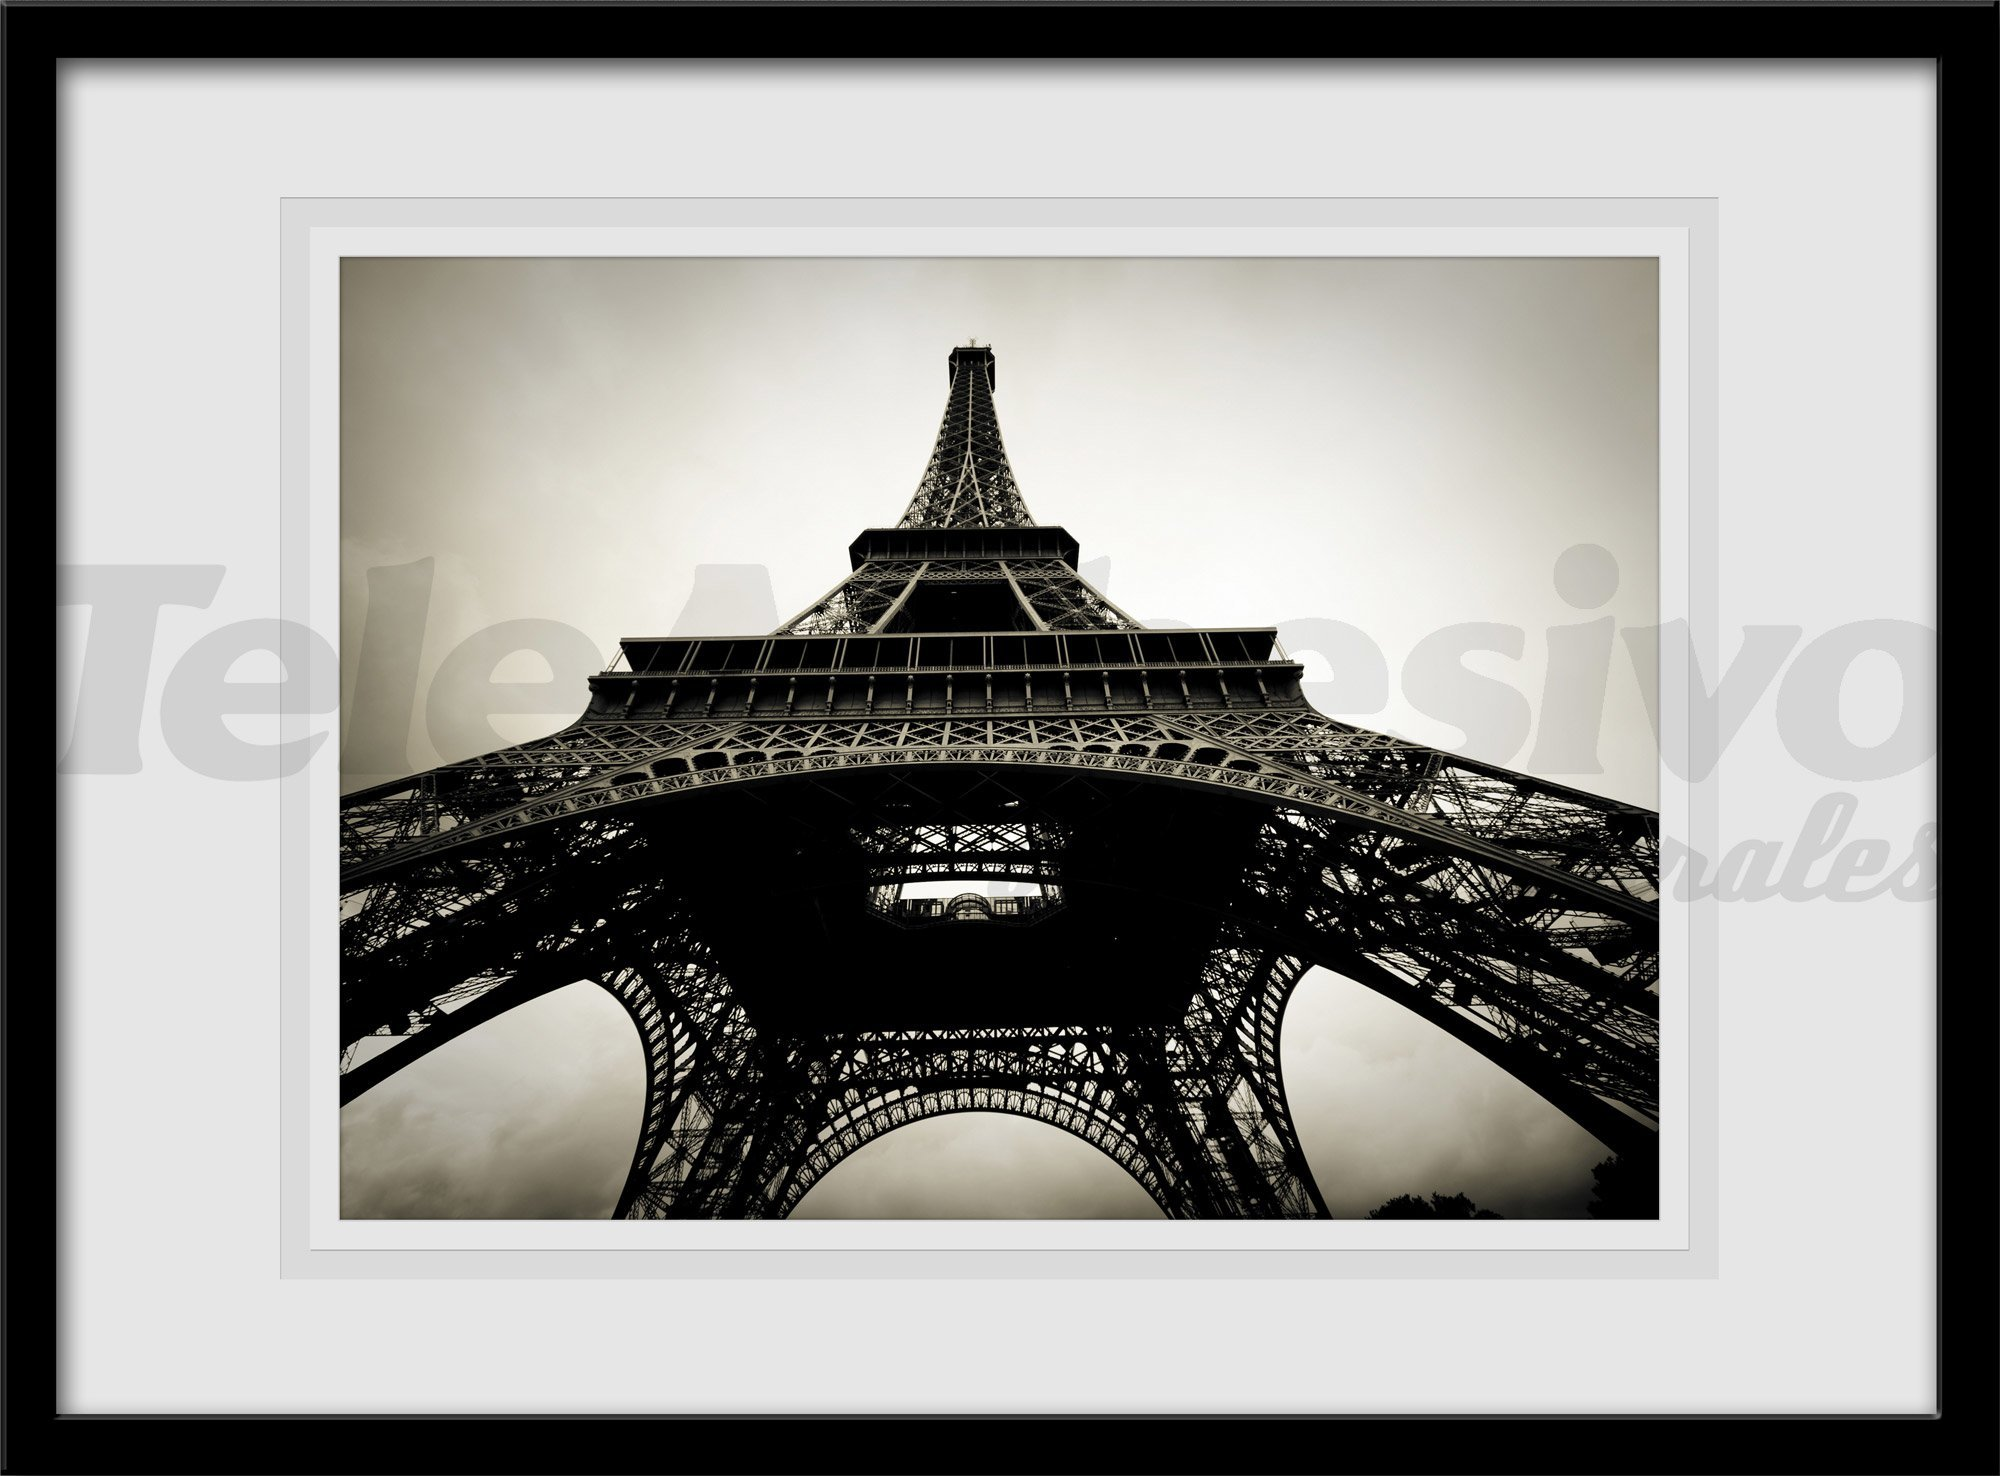 Wandtattoos: Eiffel-Toast